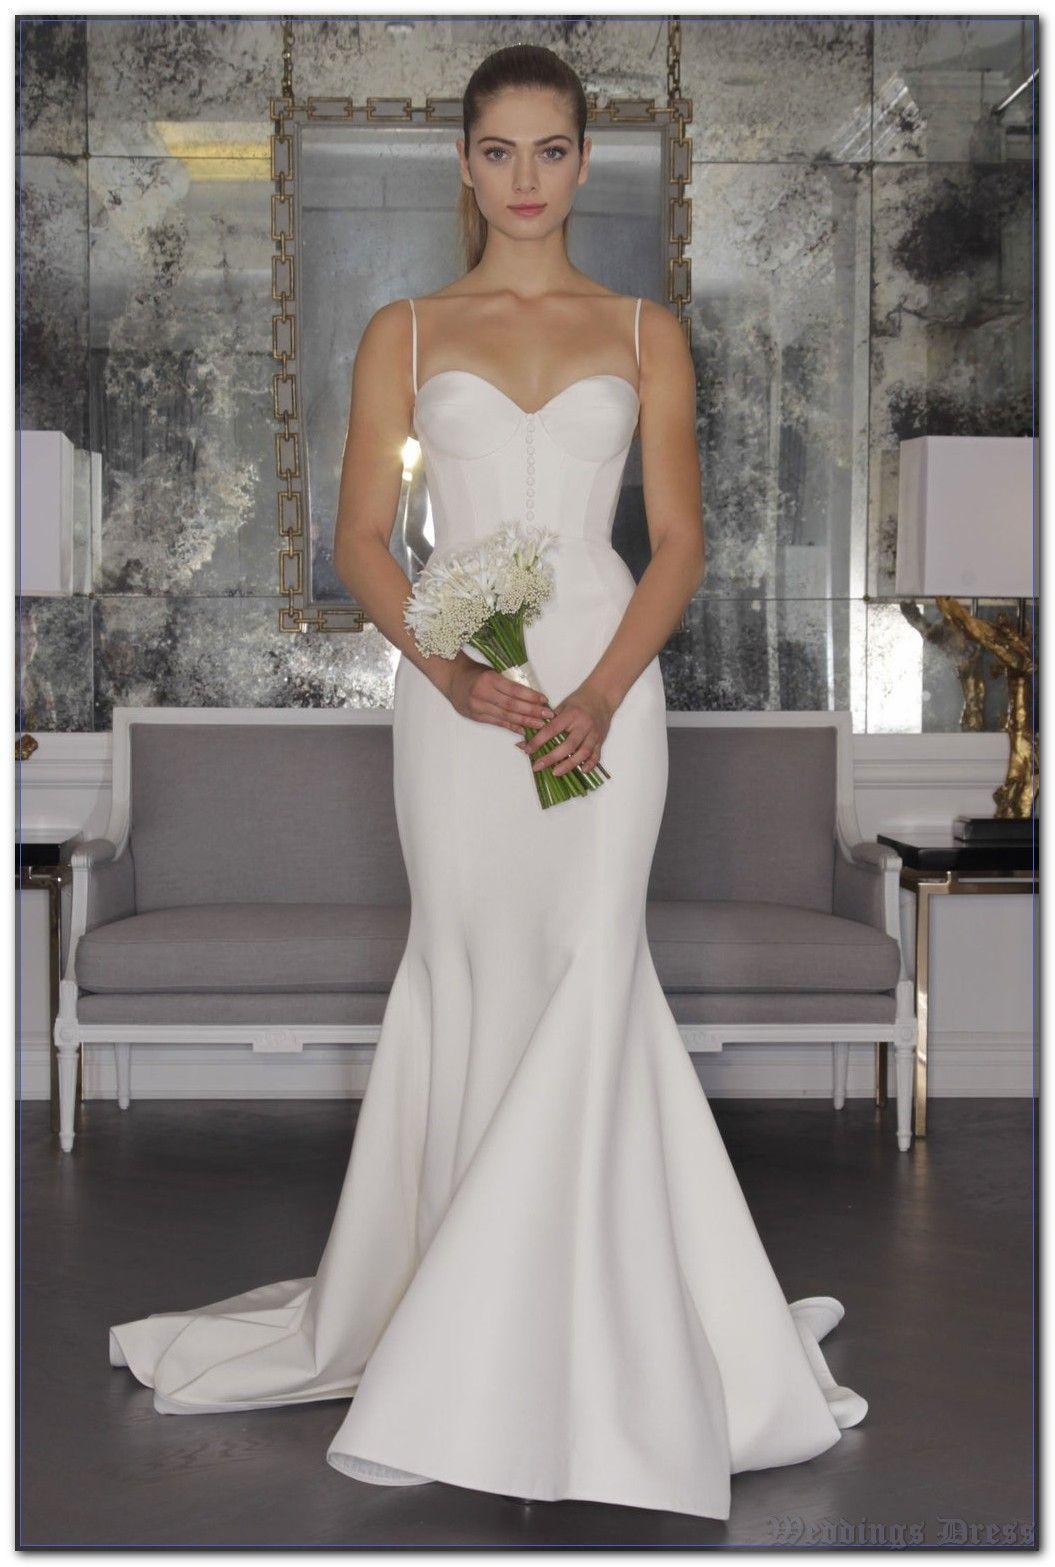 Make Your Weddings DressA Reality